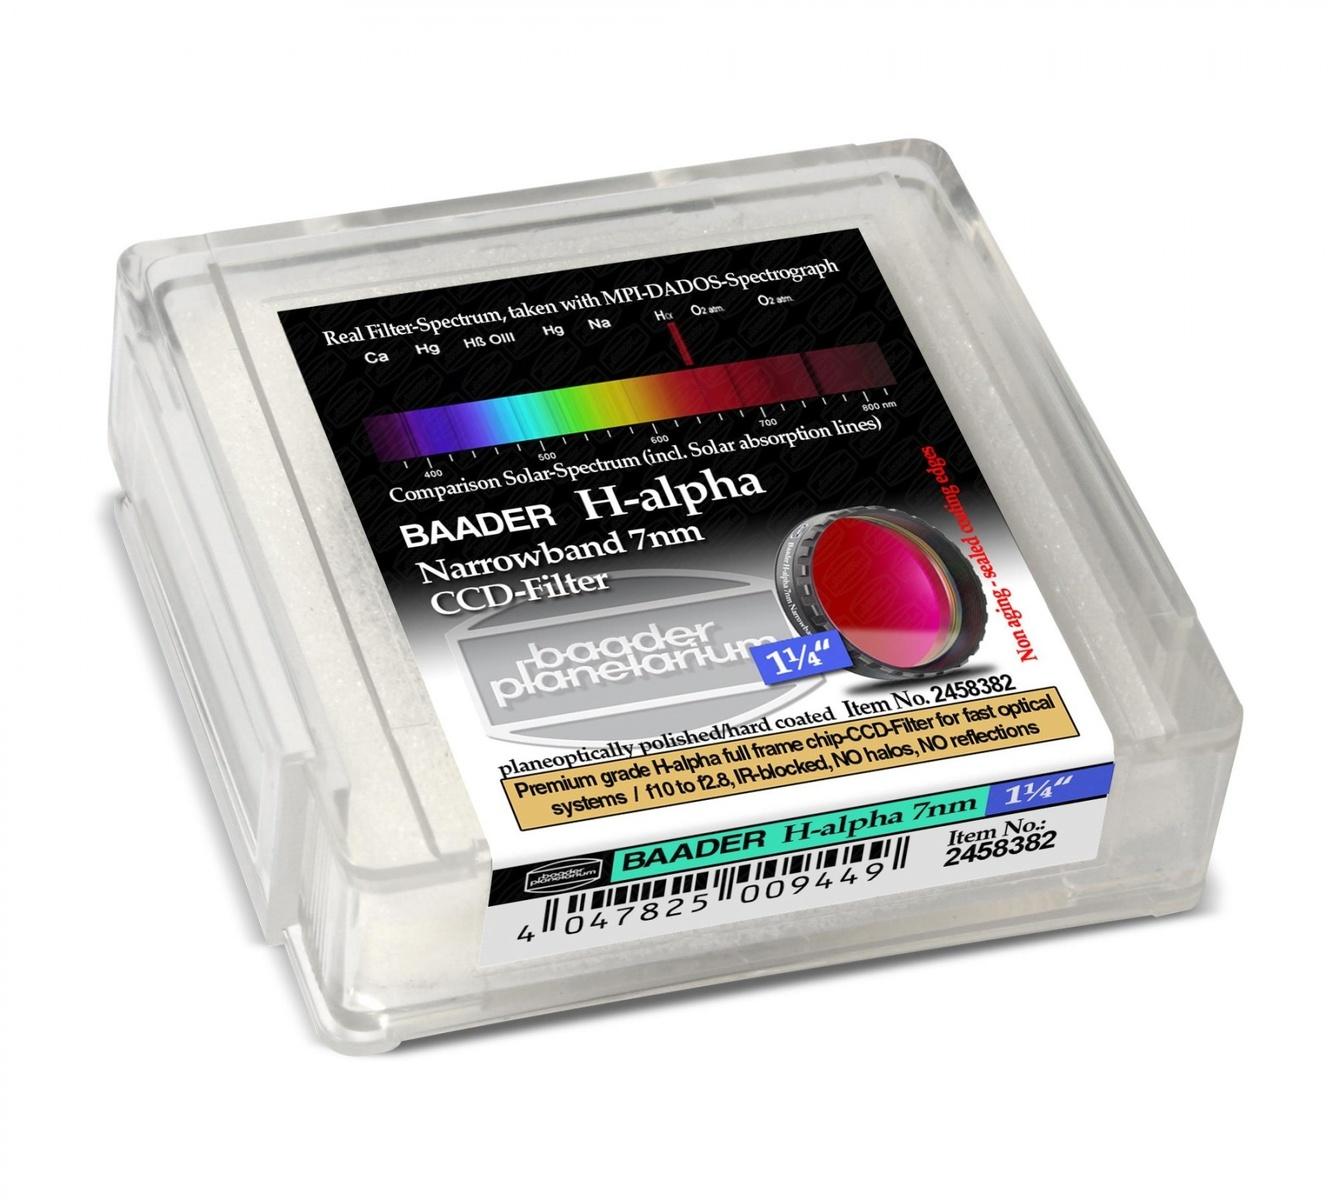 baader-h-alpha-7nm-ccd-narrowband-filter-1-1-4--a6b.thumb.jpg.579c736b5c52a2331922e36efeacb0b9.jpg